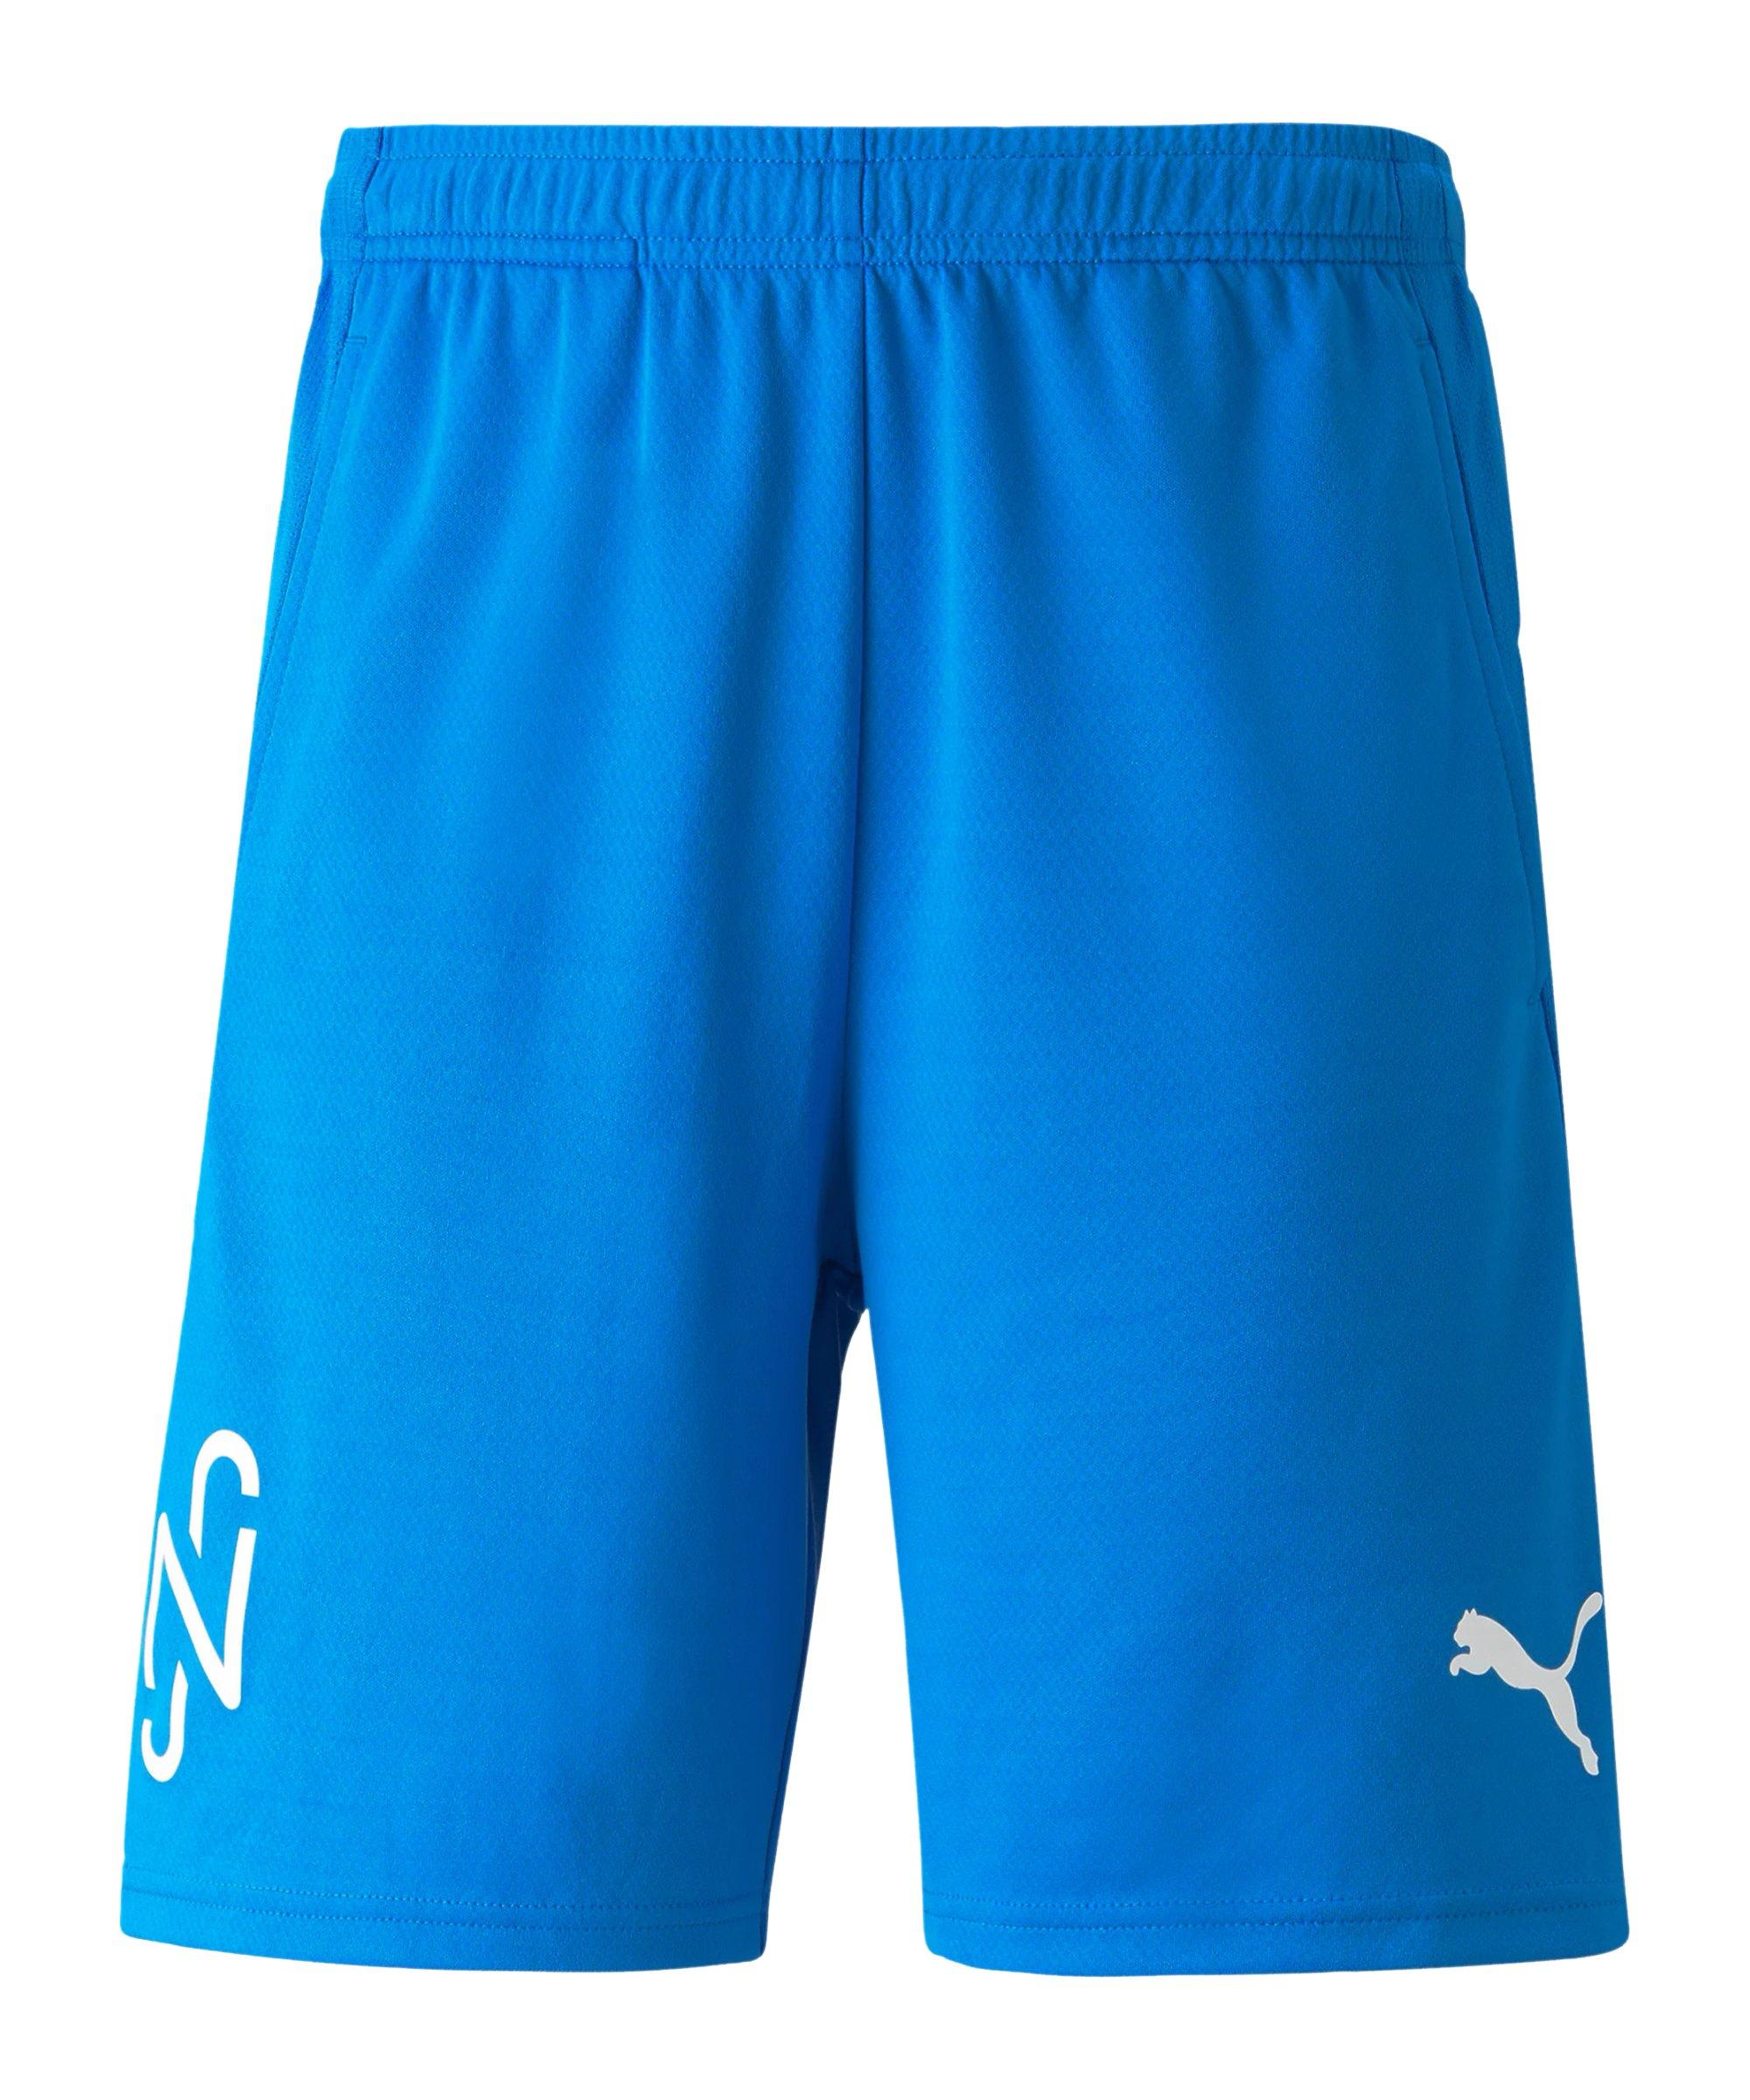 PUMA NJR Copa Short Blau F08 - blau